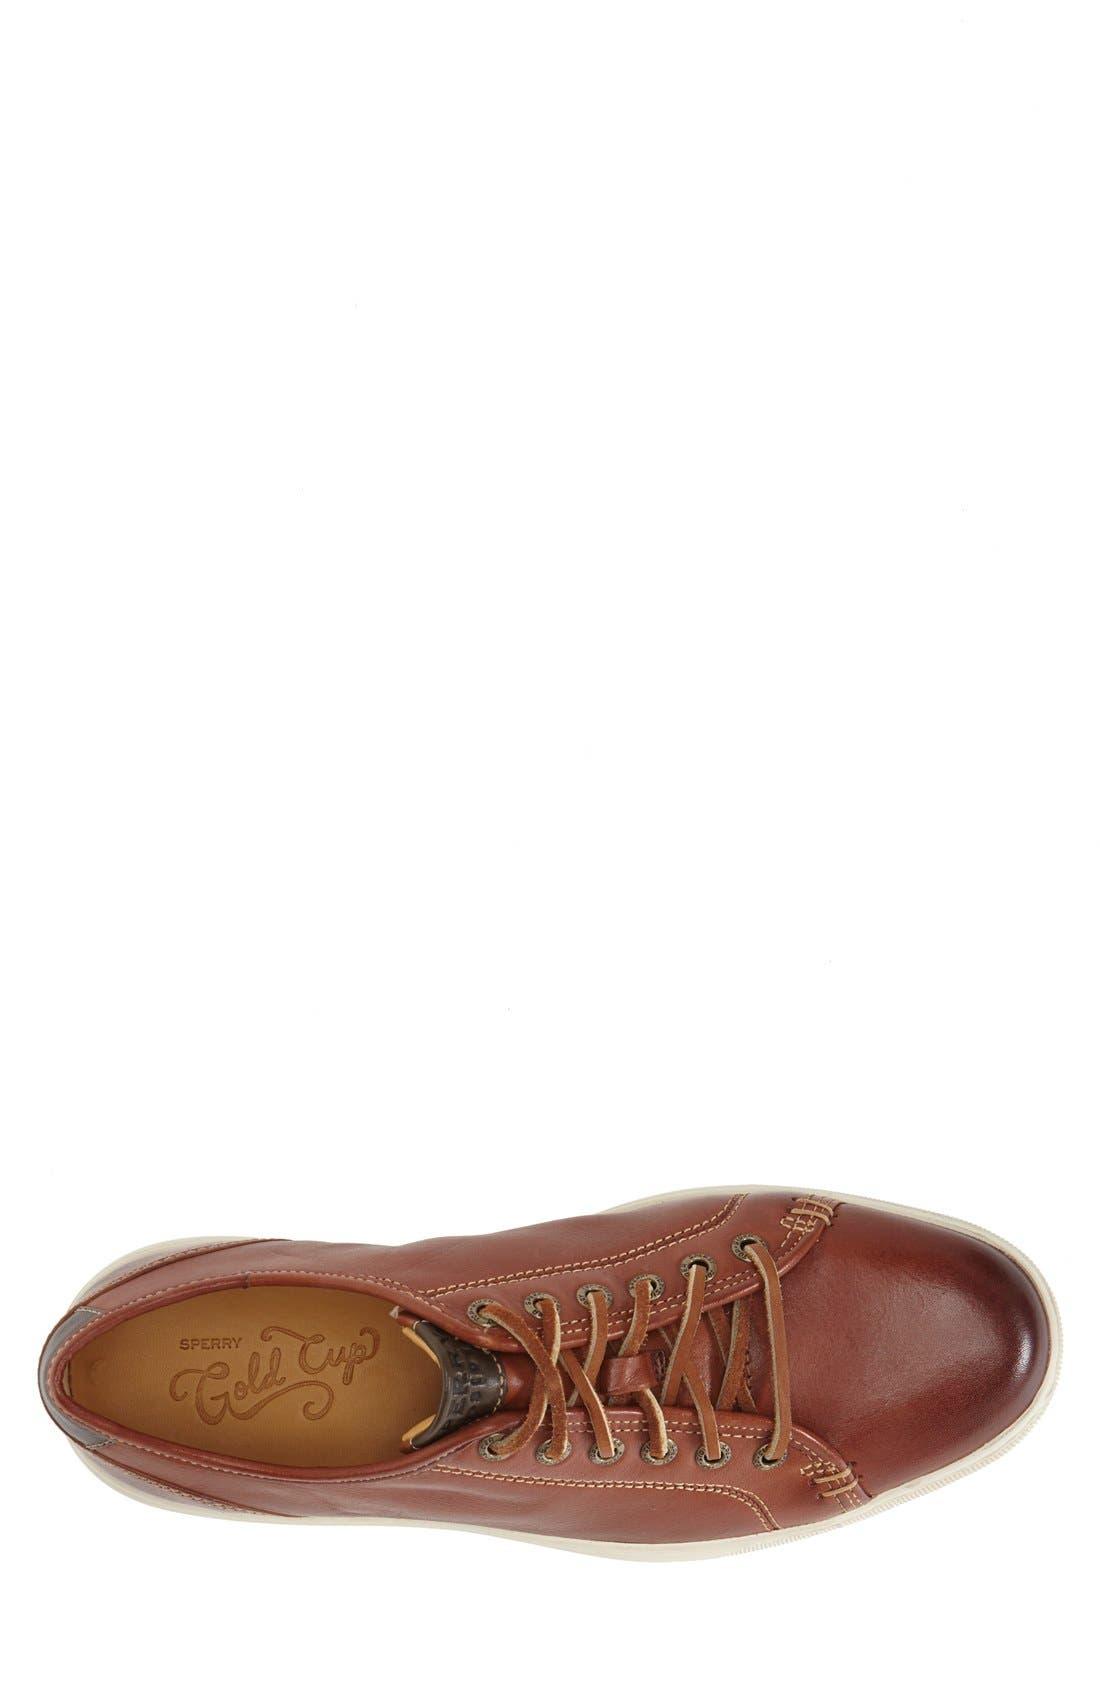 Alternate Image 3  - Sperry 'Gold Cup - LTT' Sneaker (Men)'